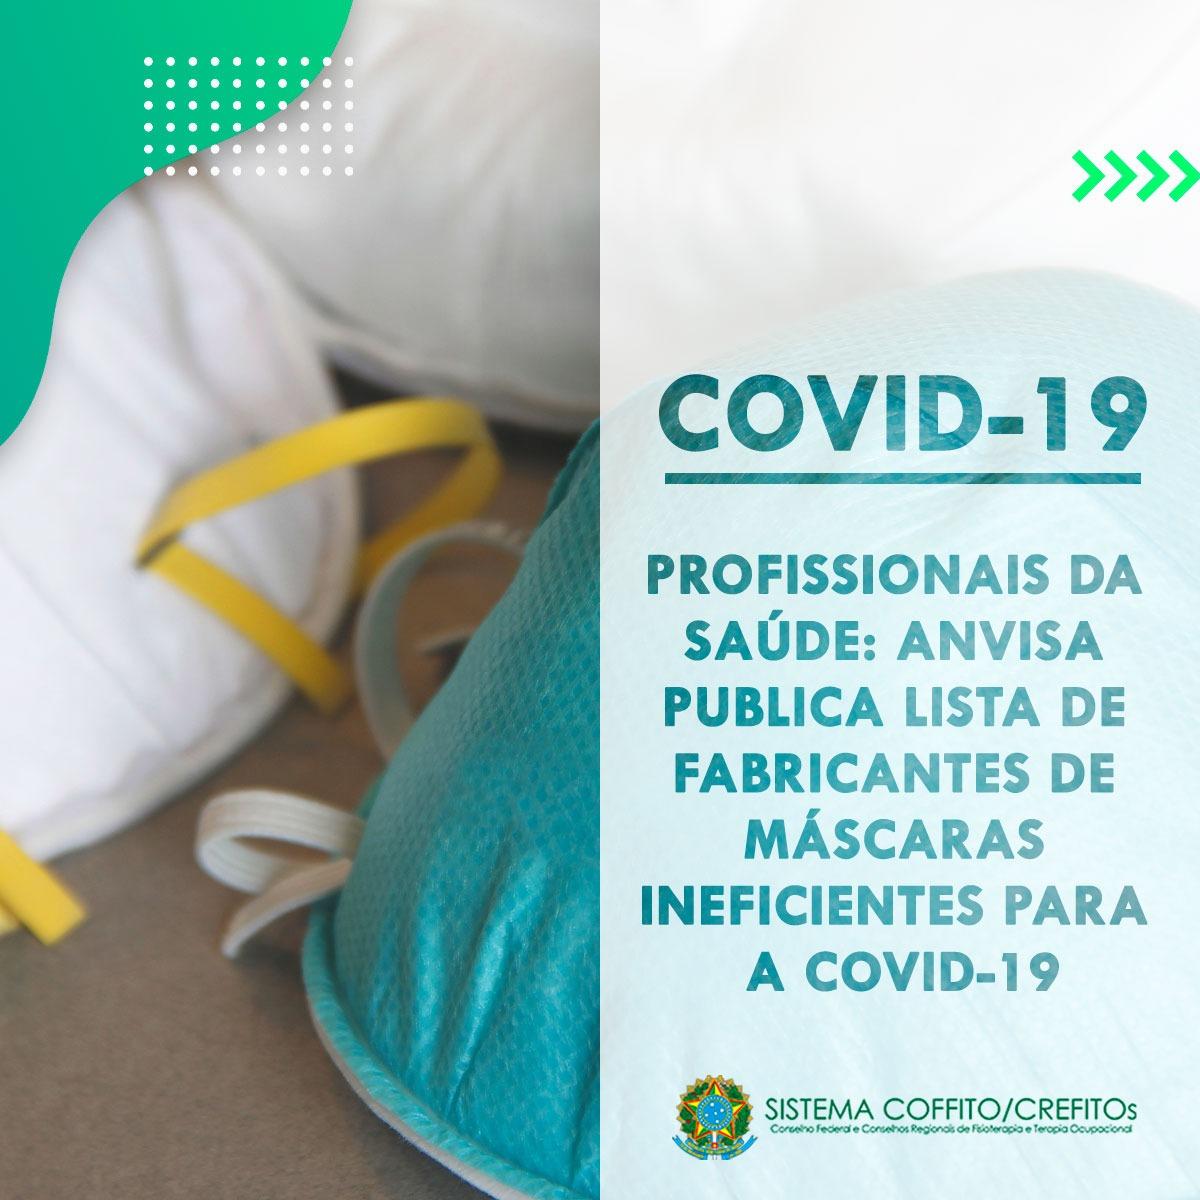 ANVISA publica lista de fabricantes de máscaras ineficientes para a COVID-19